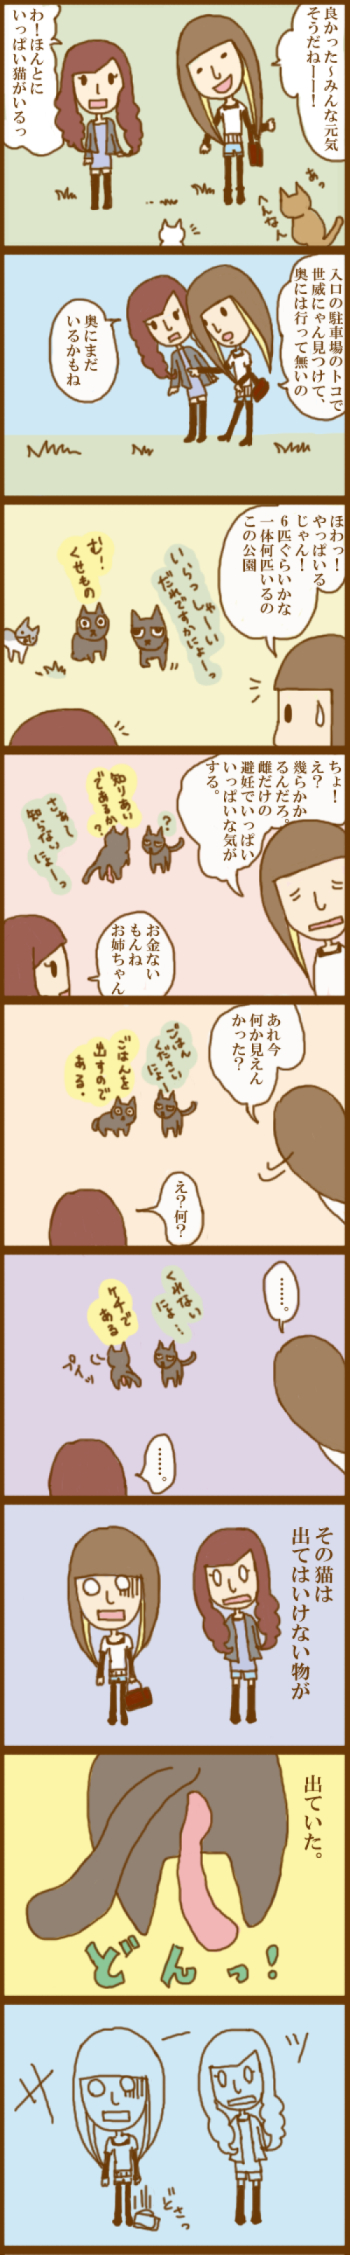 f:id:suzuokayu:20201029111107j:plain